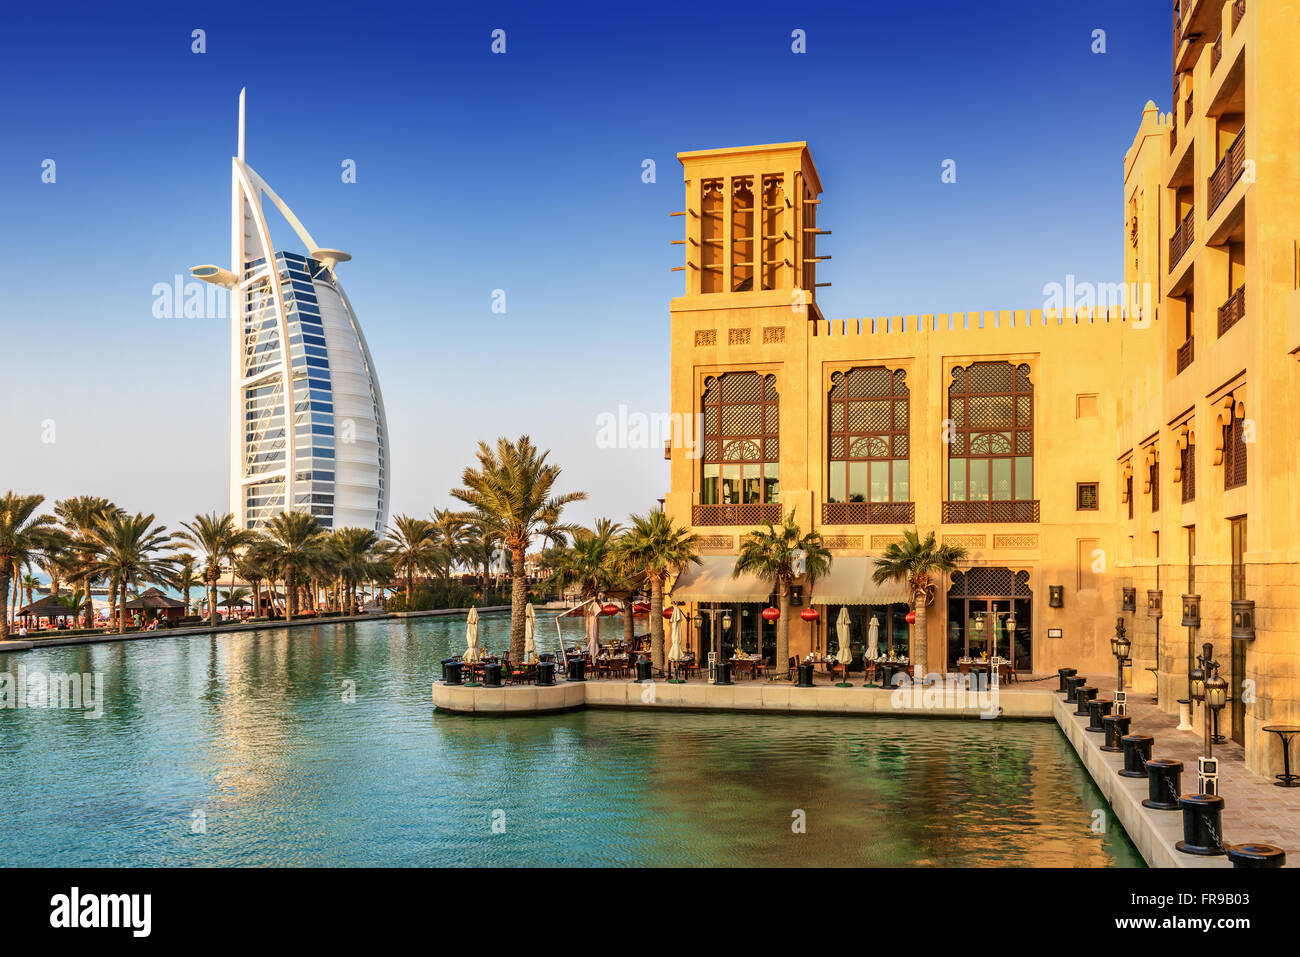 Blick auf Burj Al Arab Hotel Madinat Jumeirah-Hotel in Dubai, Vereinigte Arabische Emirate, Naher Osten Stockbild